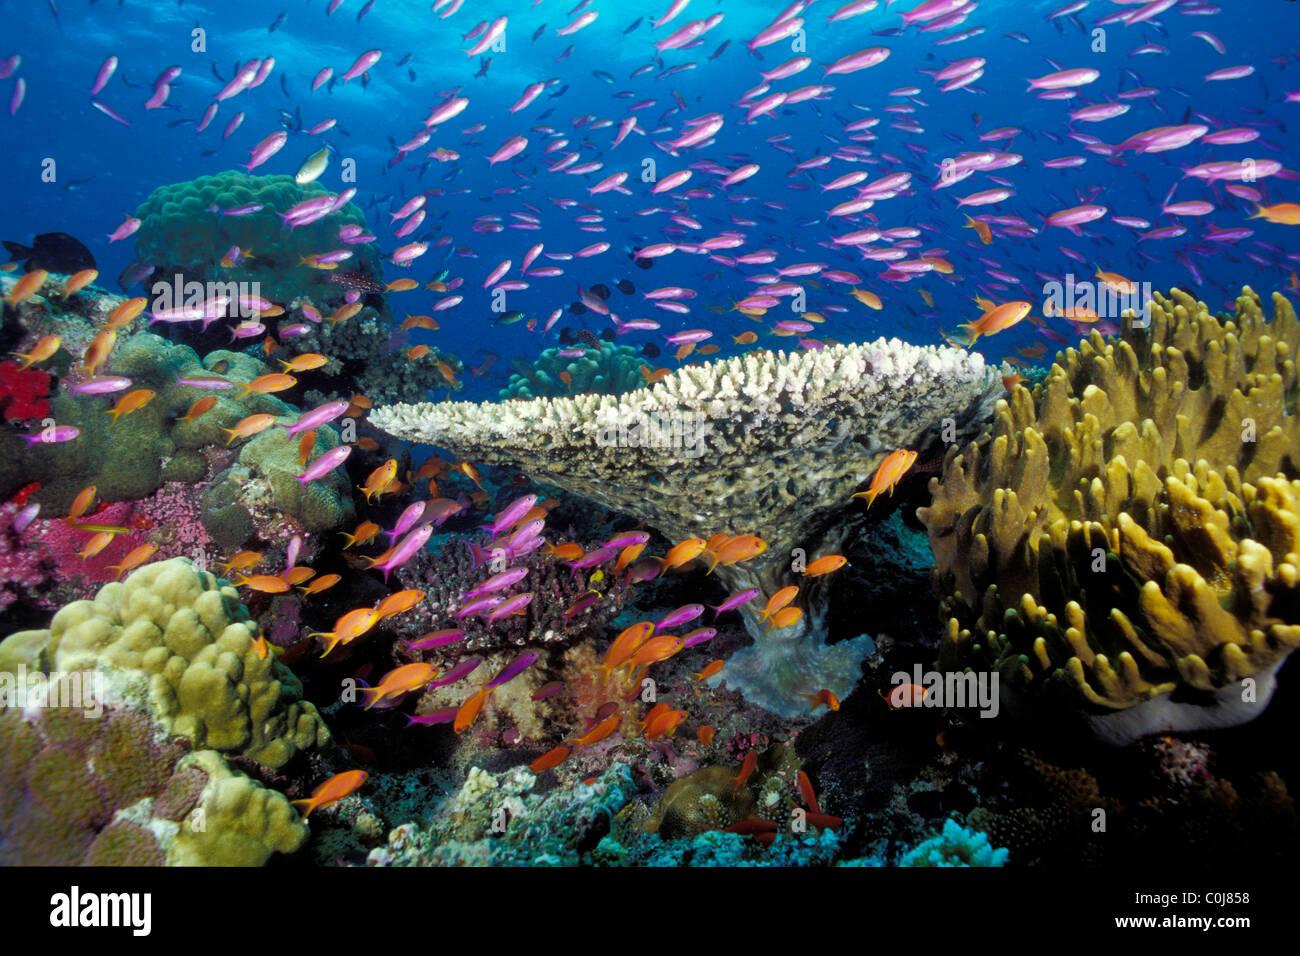 Tropical Coral reef, Figi, Oceano Pacifico Immagini Stock